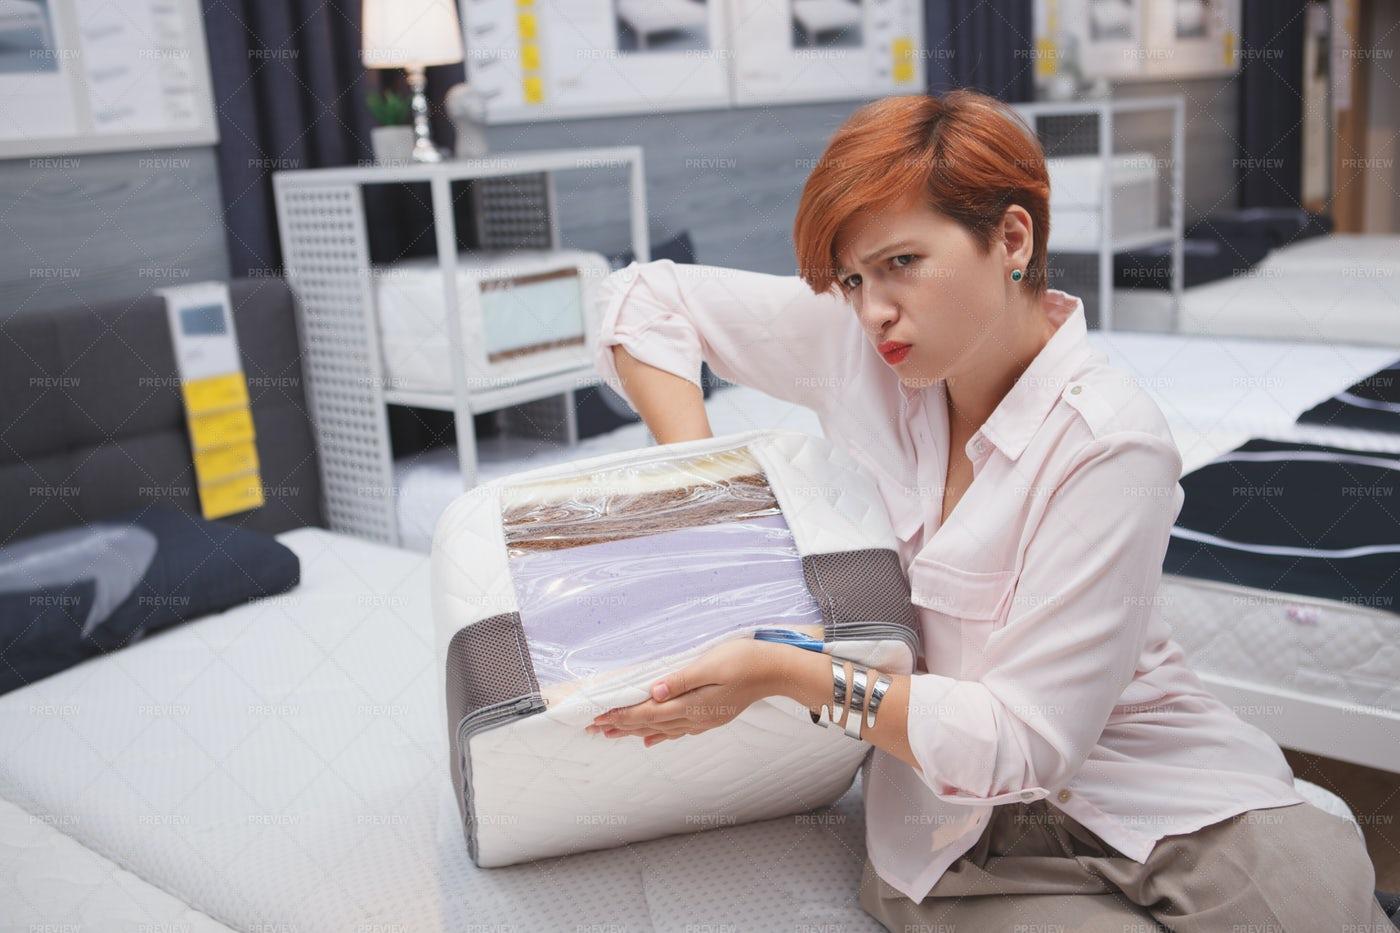 Woman Squeezing Mattress: Stock Photos